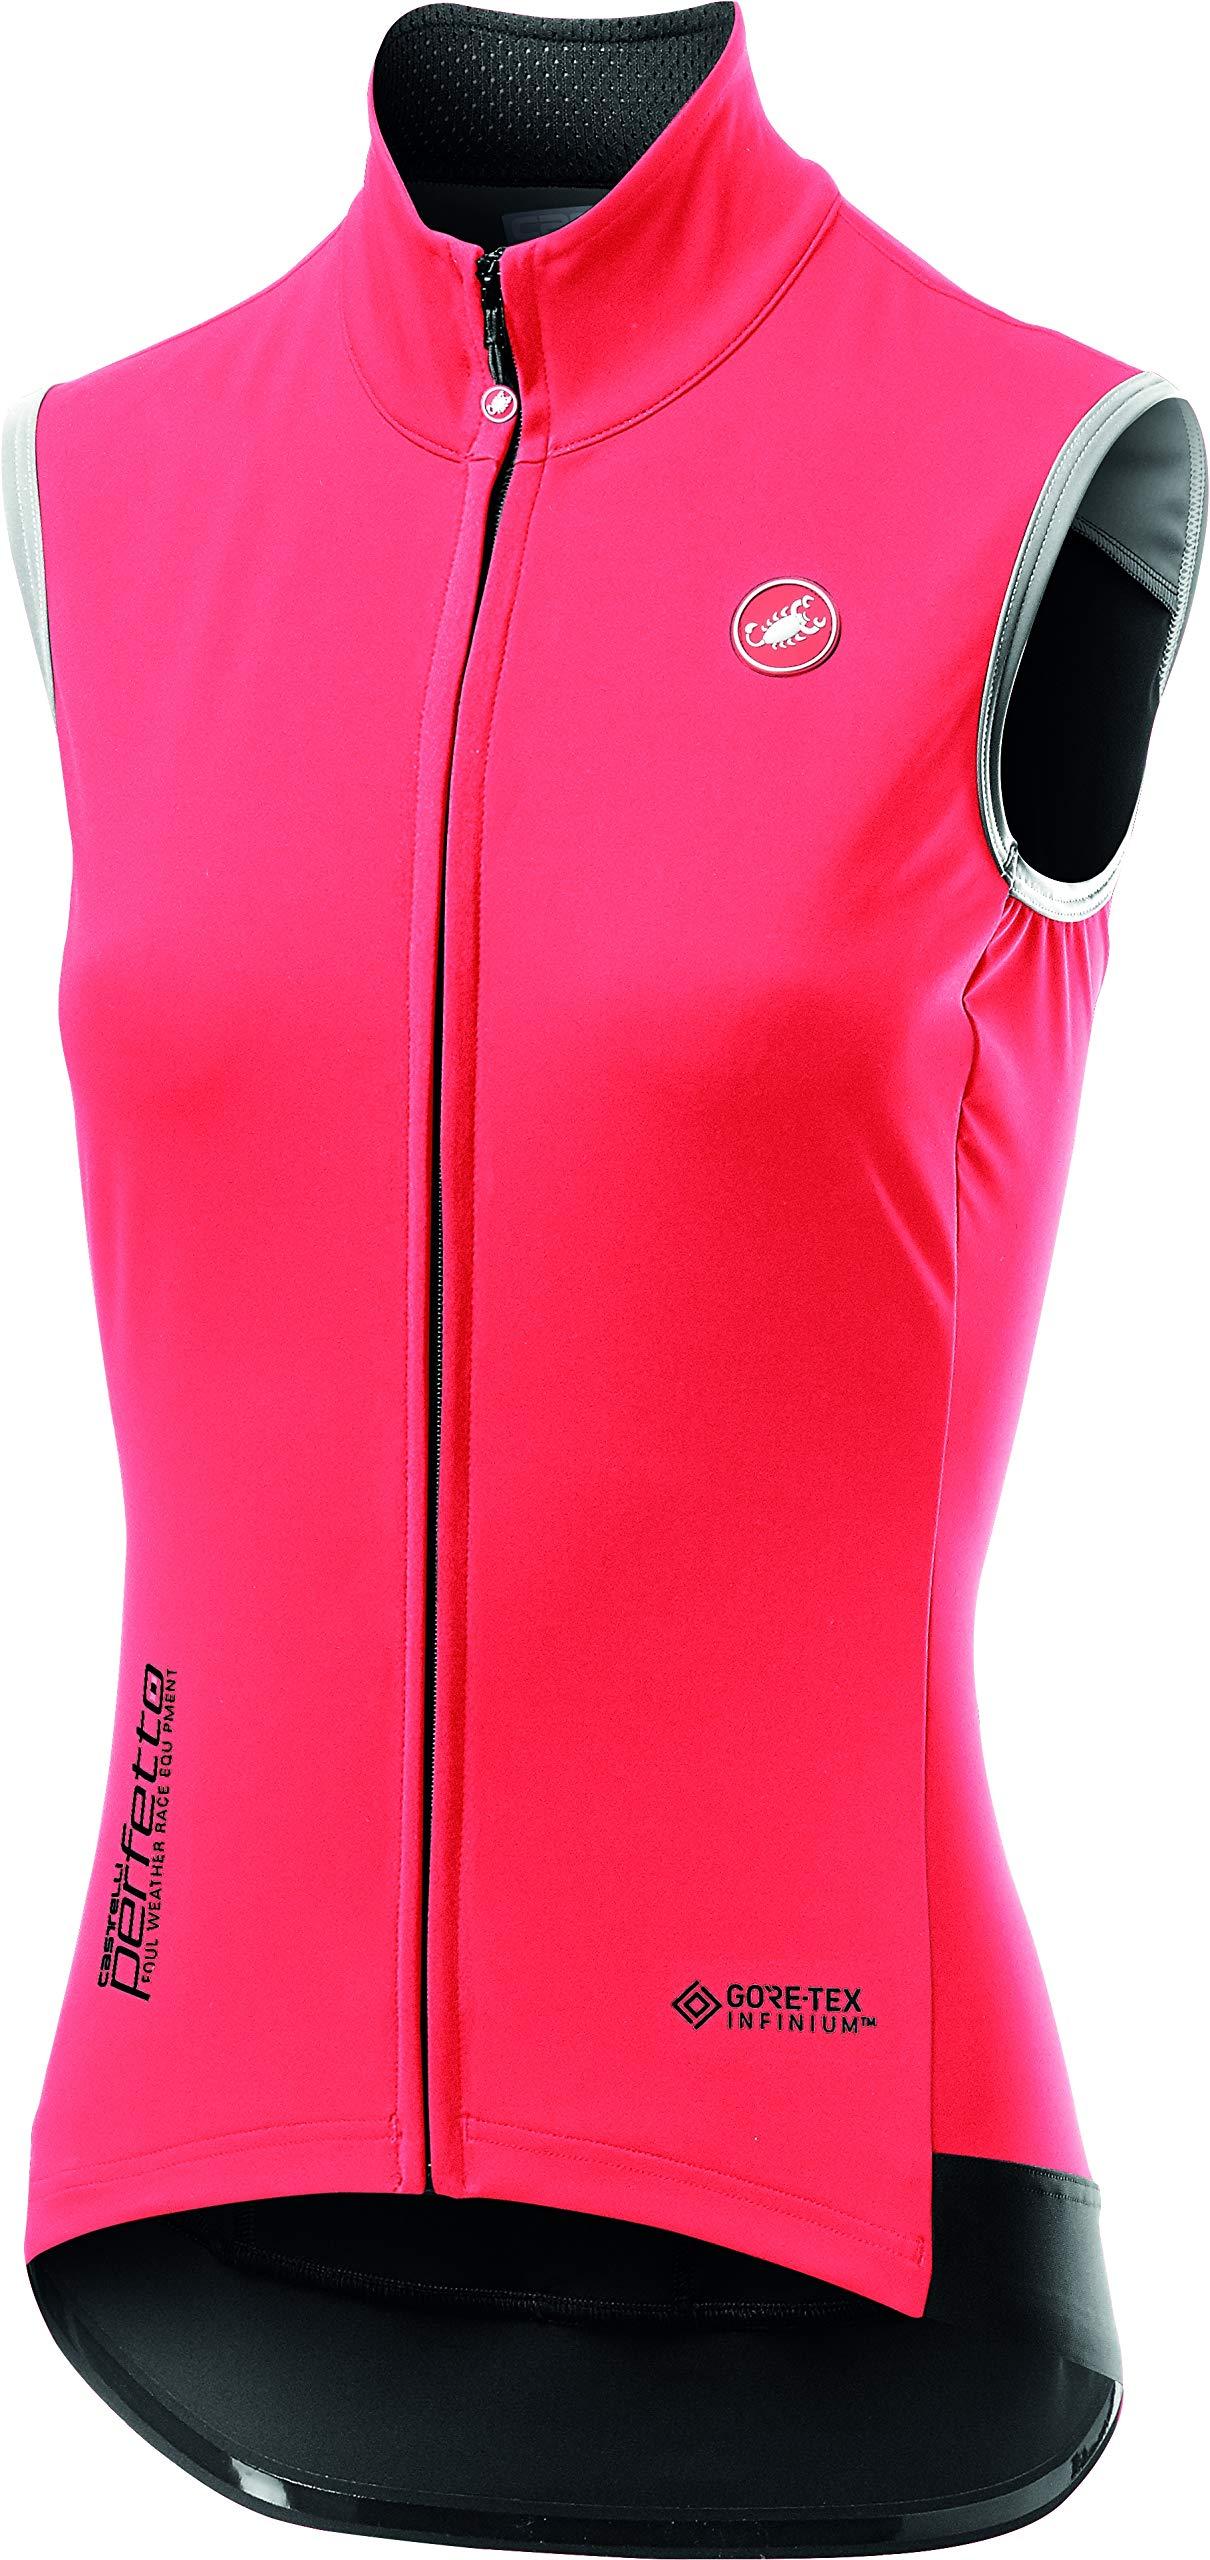 Castelli Perfetto ROS Vest - Women's Brilliant Pink, M by Castelli